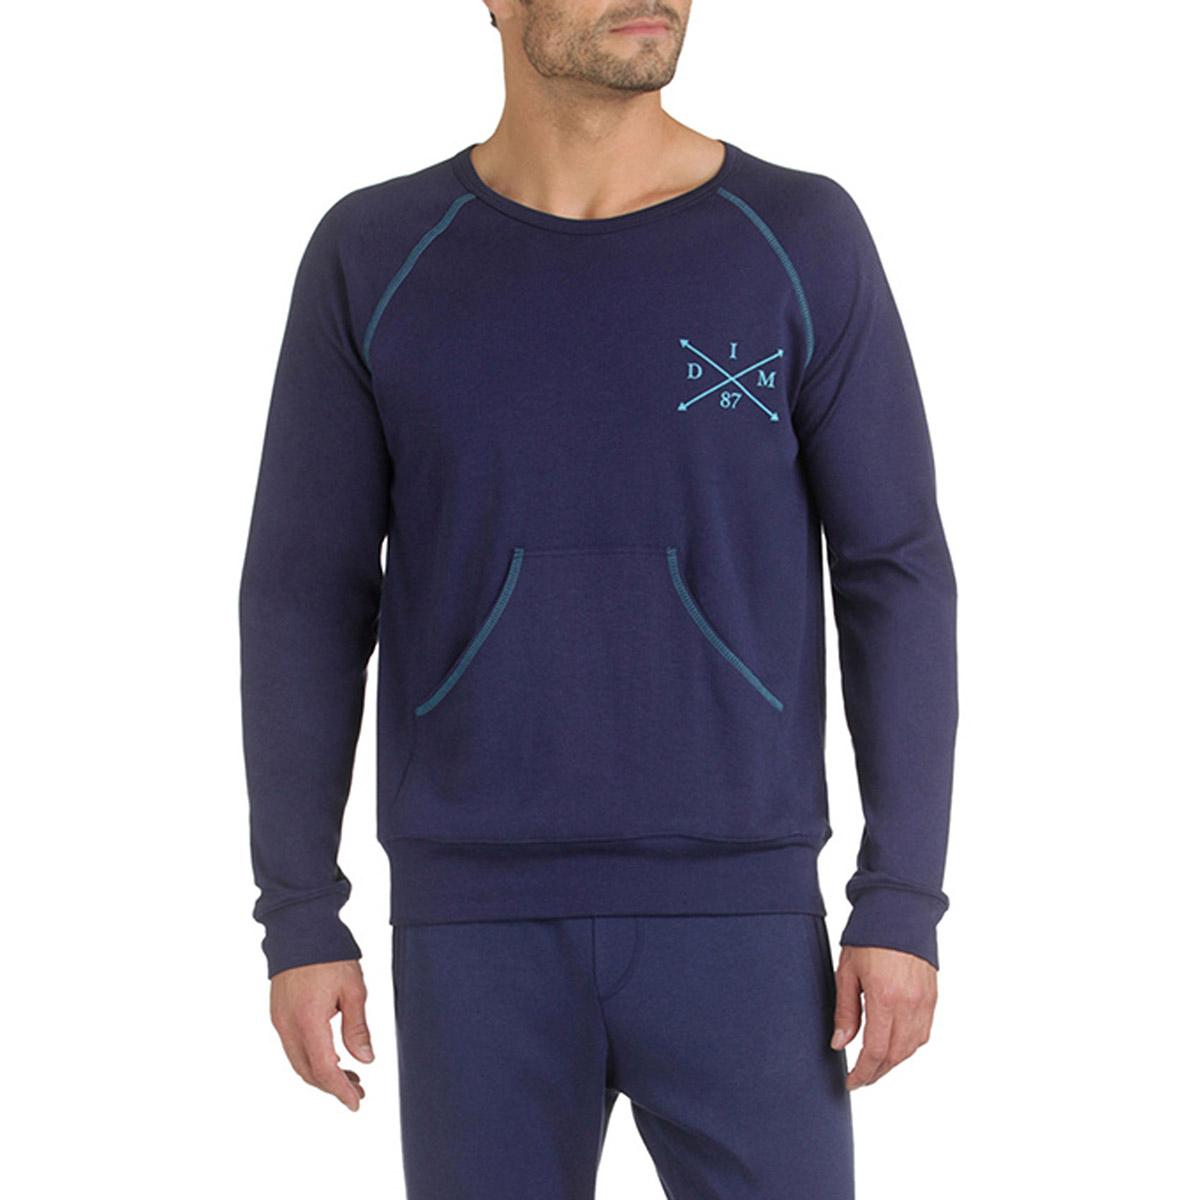 Sweatshirt de pyjama bleu marine 100% coton Homme